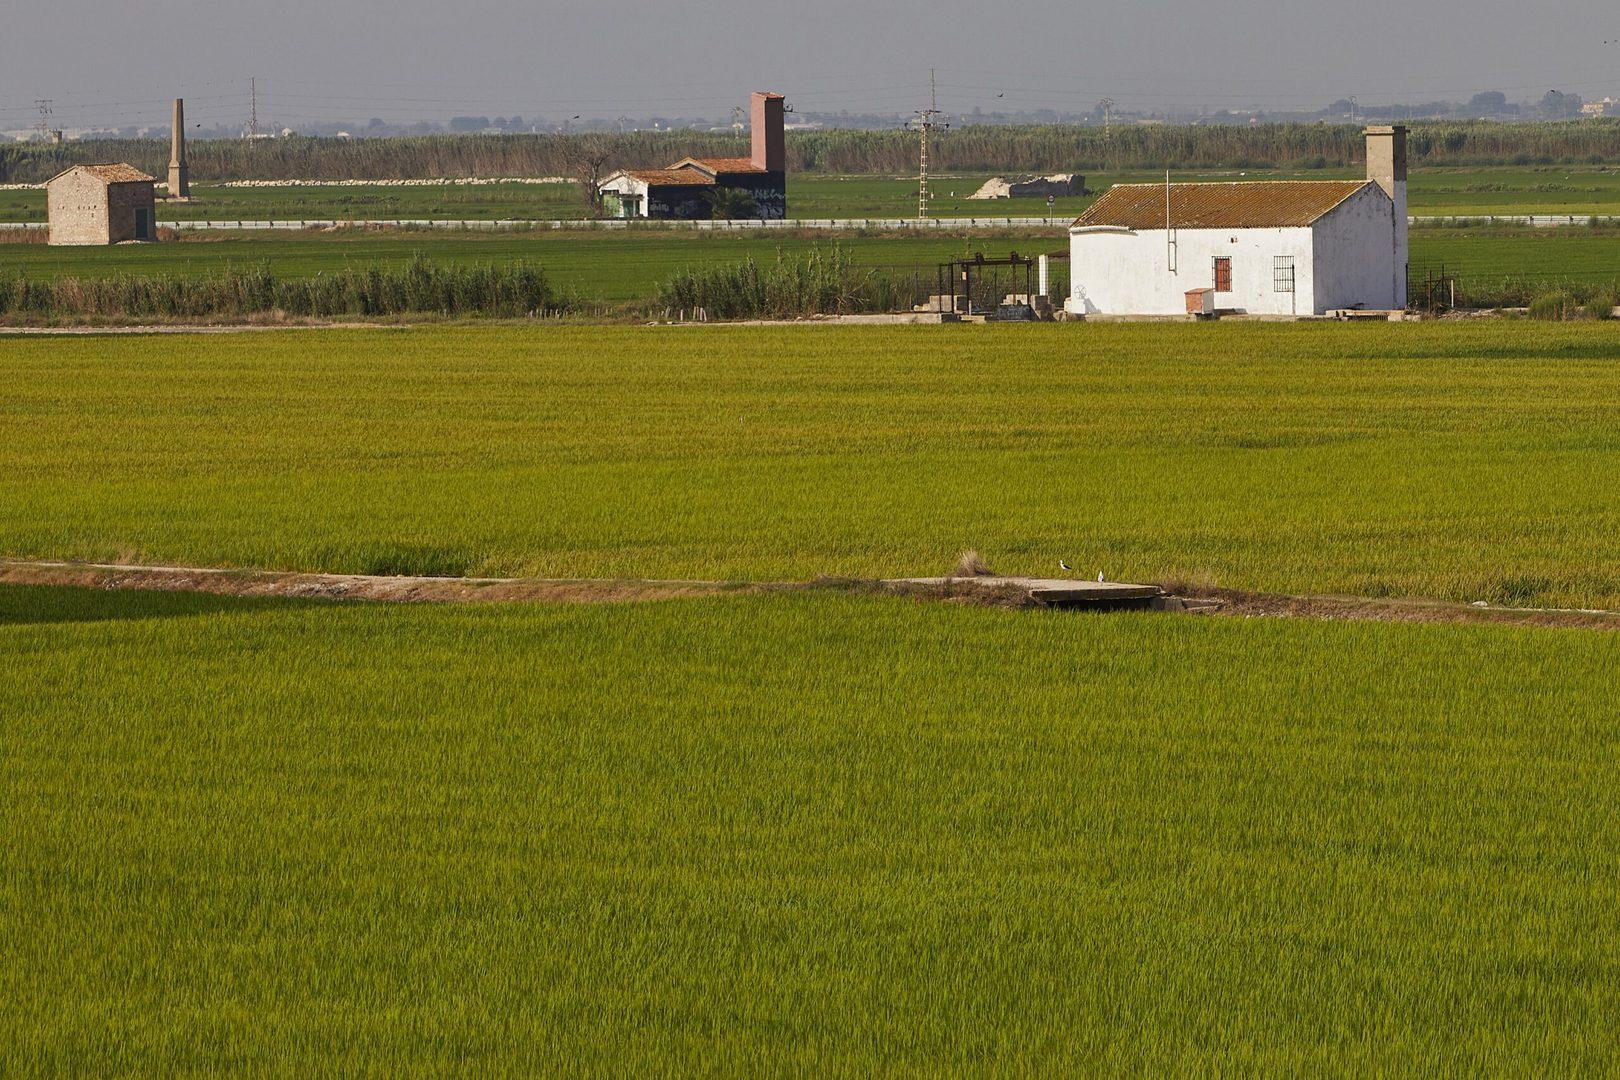 La huerta_Valencia_landbrug_studierejser_alfatravel